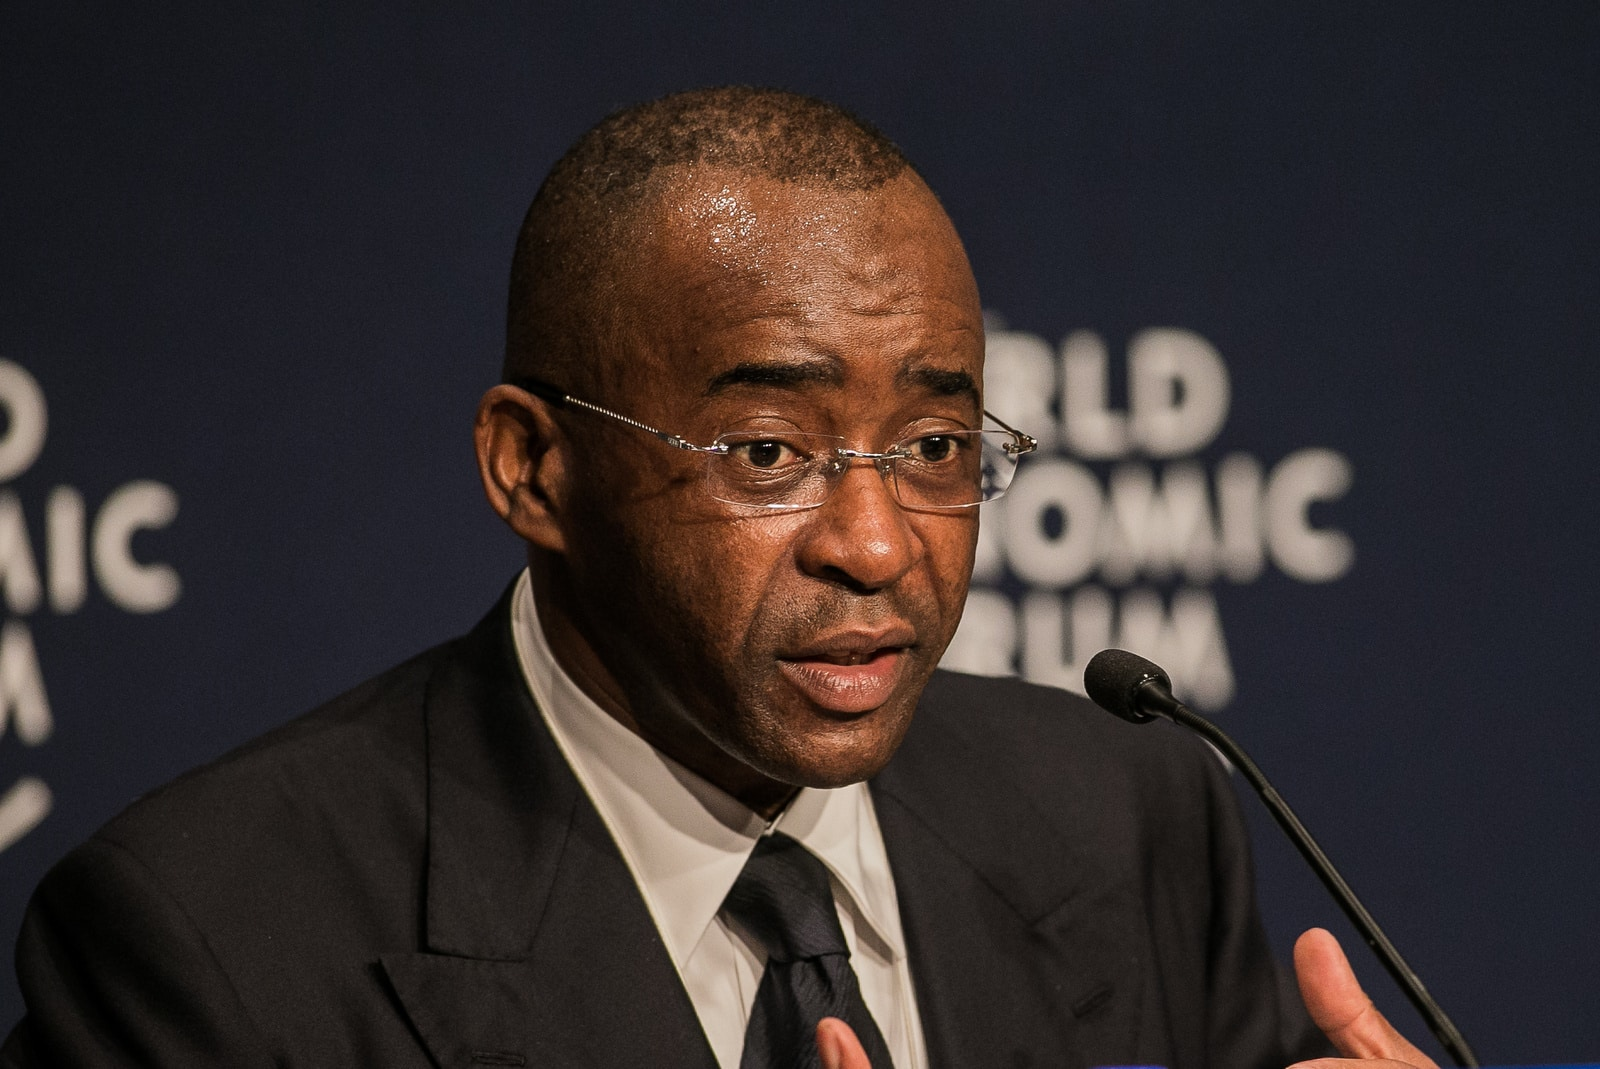 Masiyiwa donates 45 Ventilator ICU sets to Zimbabwe, urges big businesses to step in & help » 263Chat